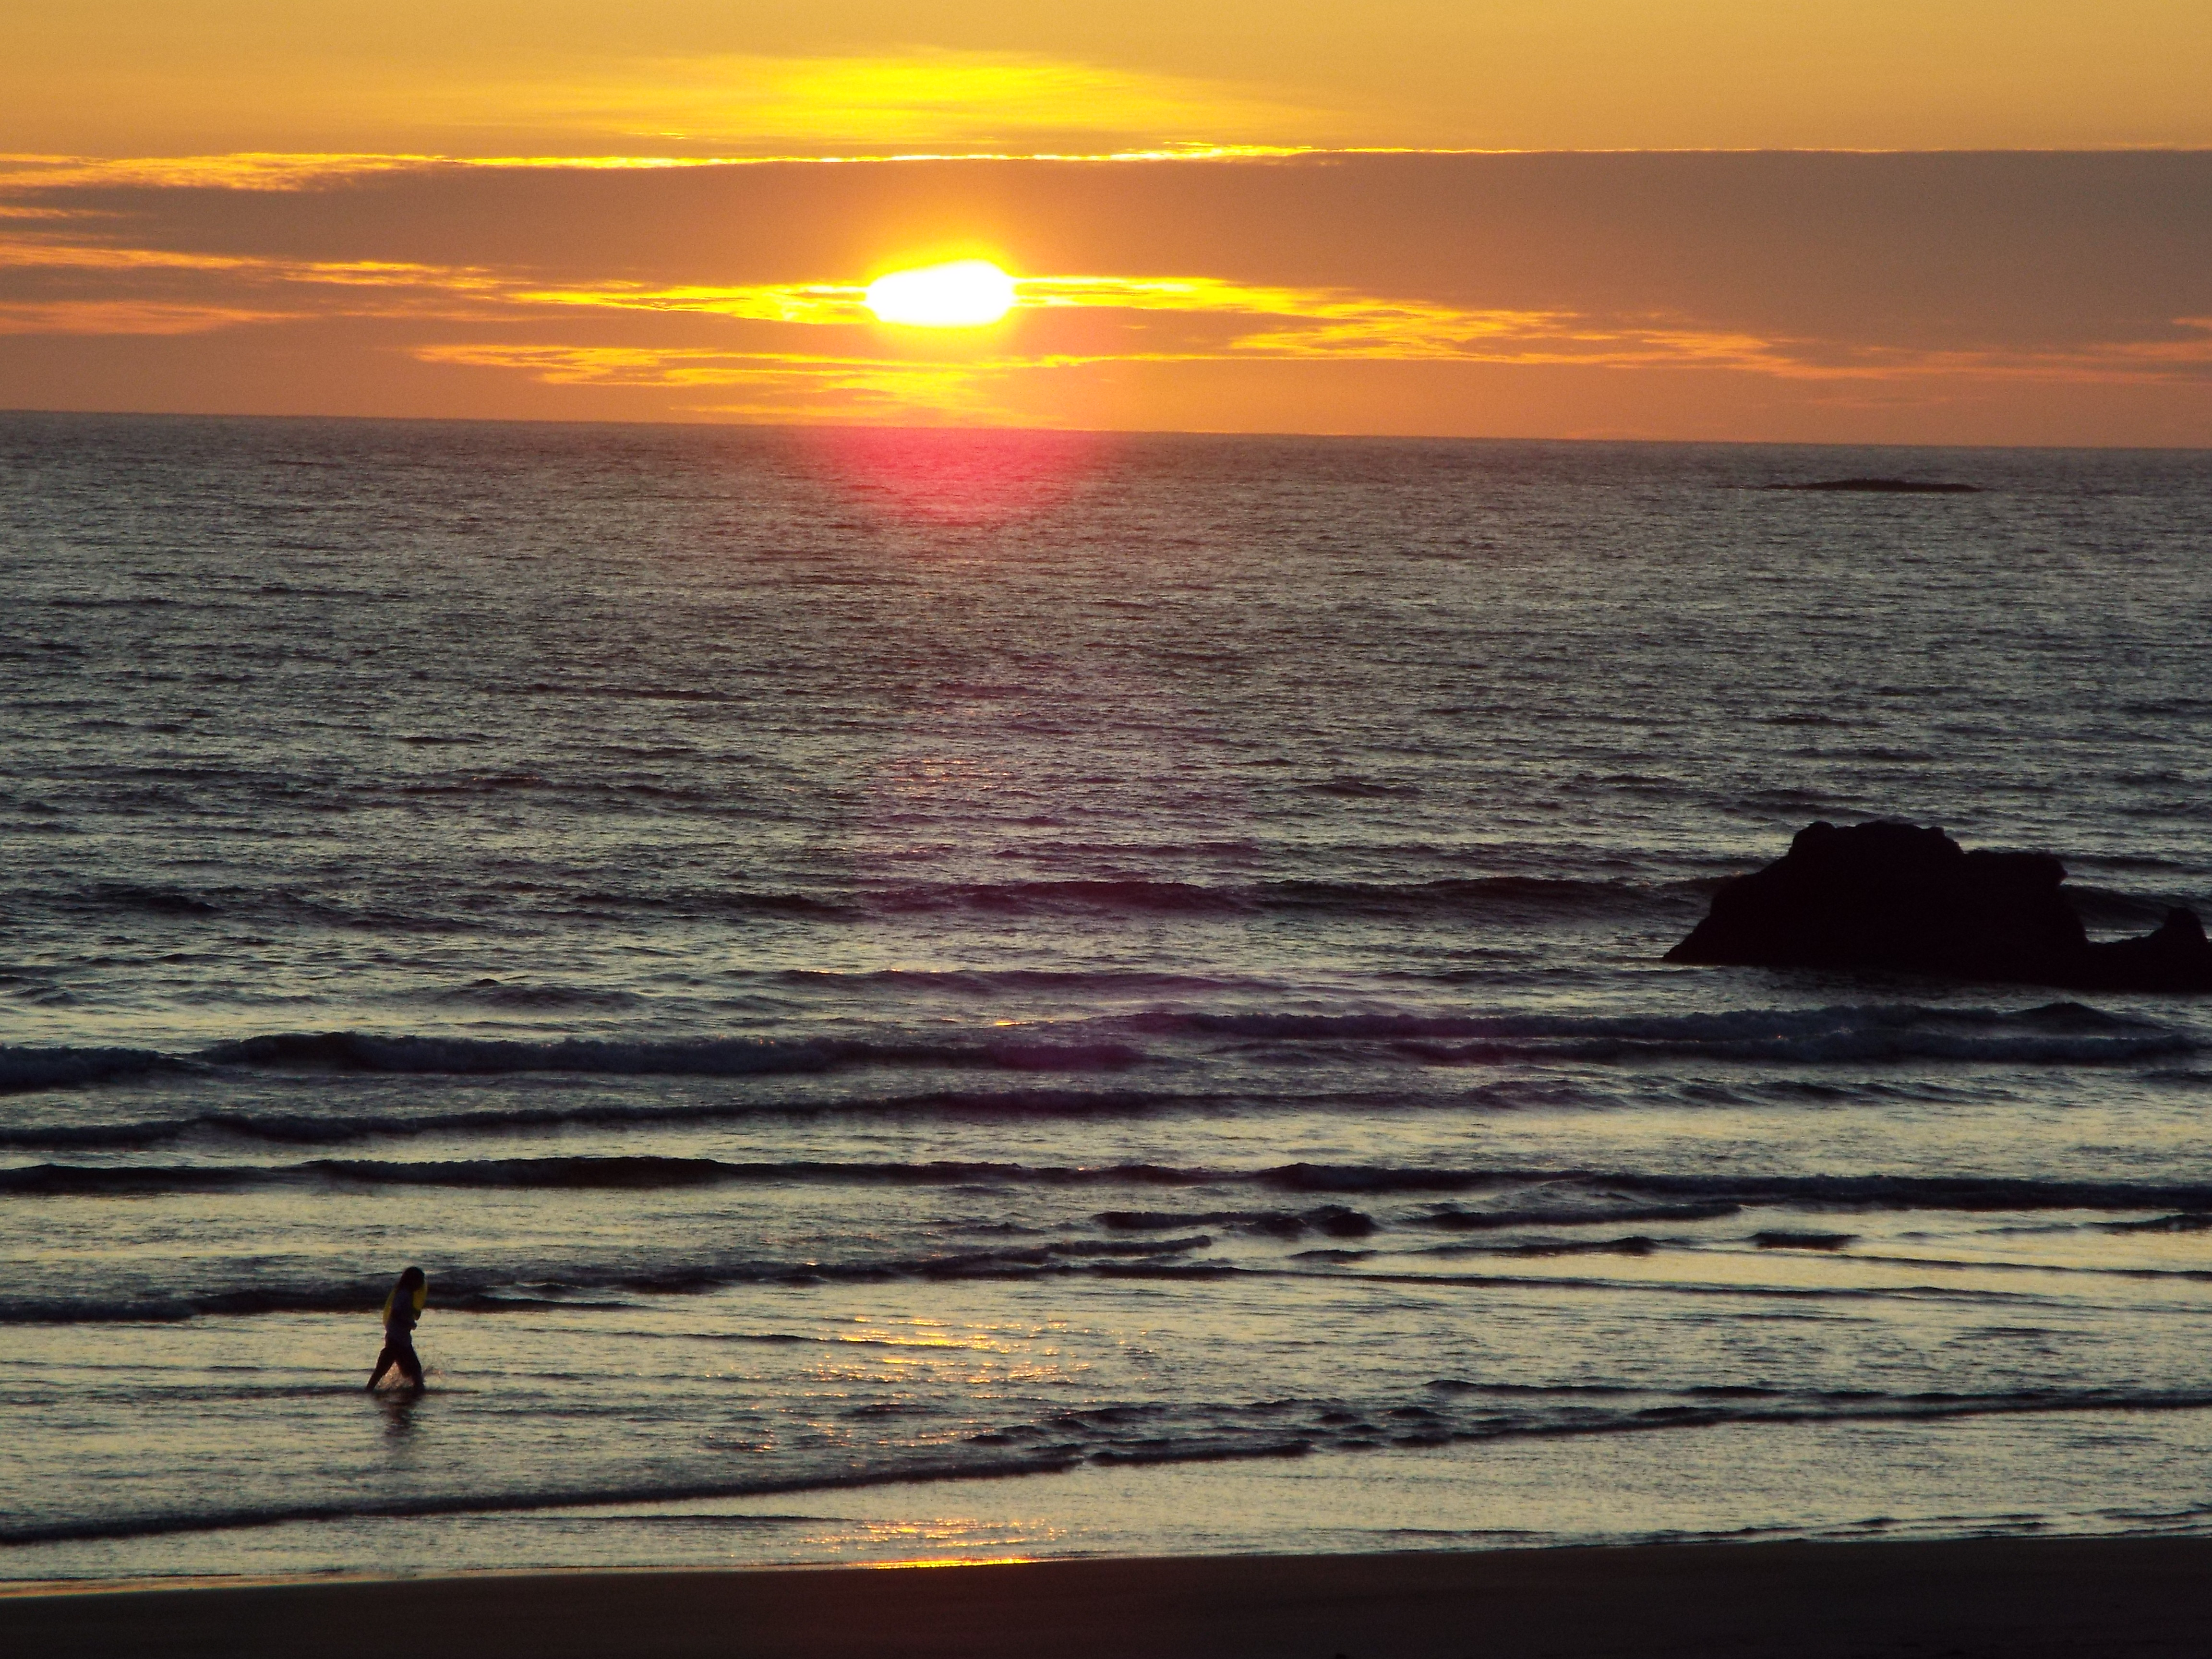 A summer sunset at Arcadia Beach along the Oregon coastline